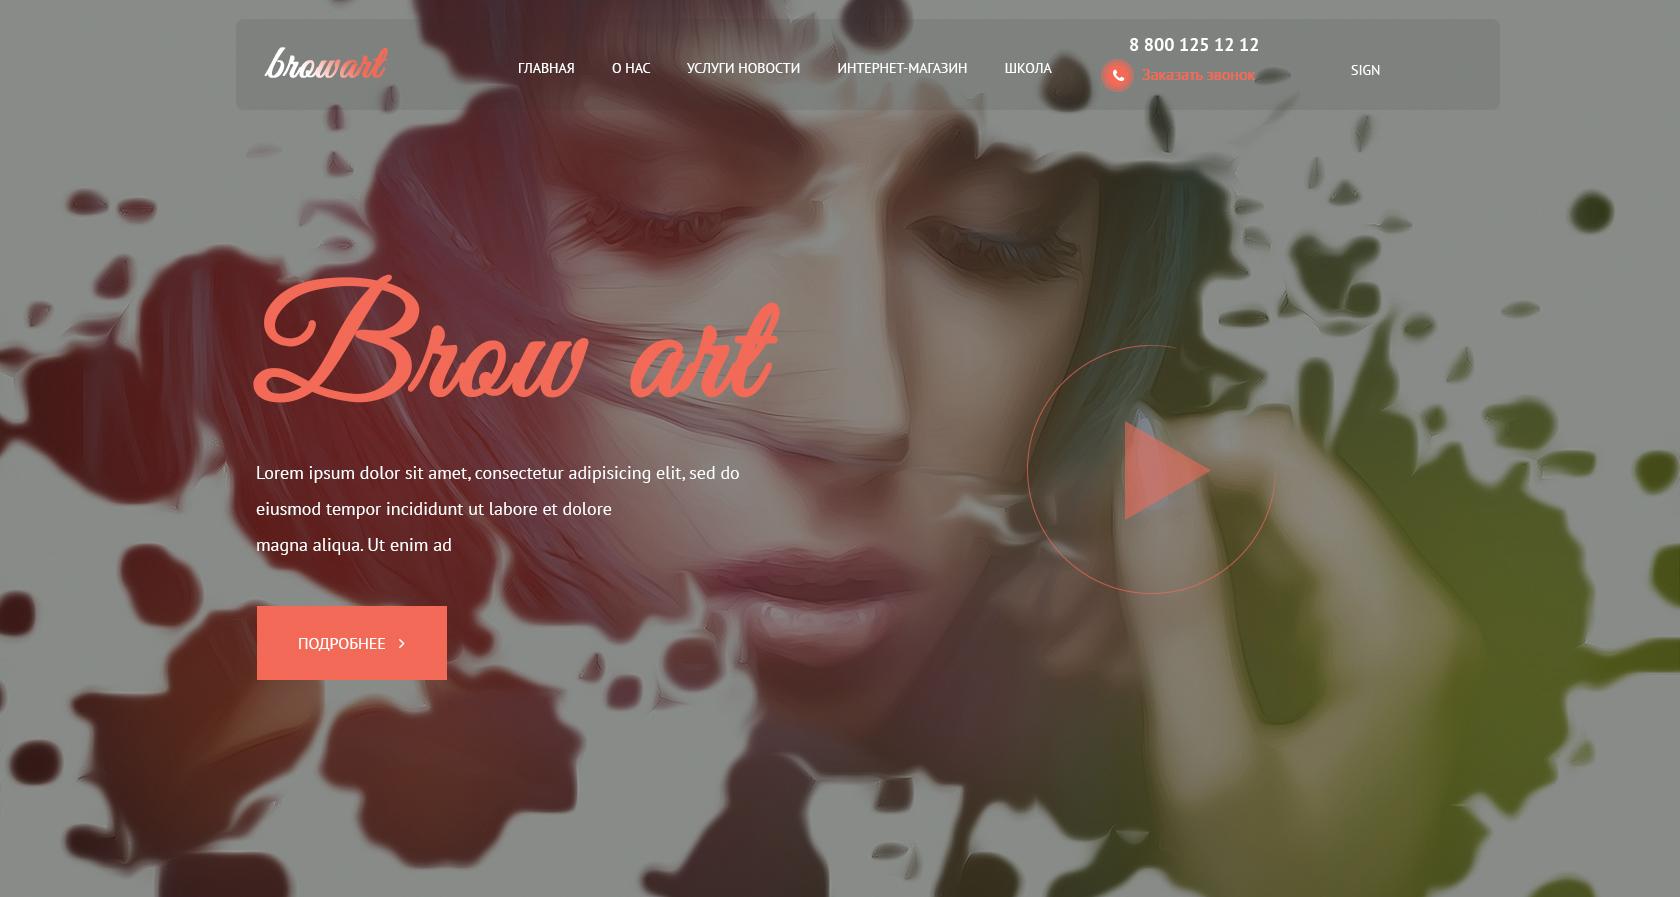 Дизайн сайта на основе готового прототипа-схемы и концепции фото f_0585a270792bcf39.jpg